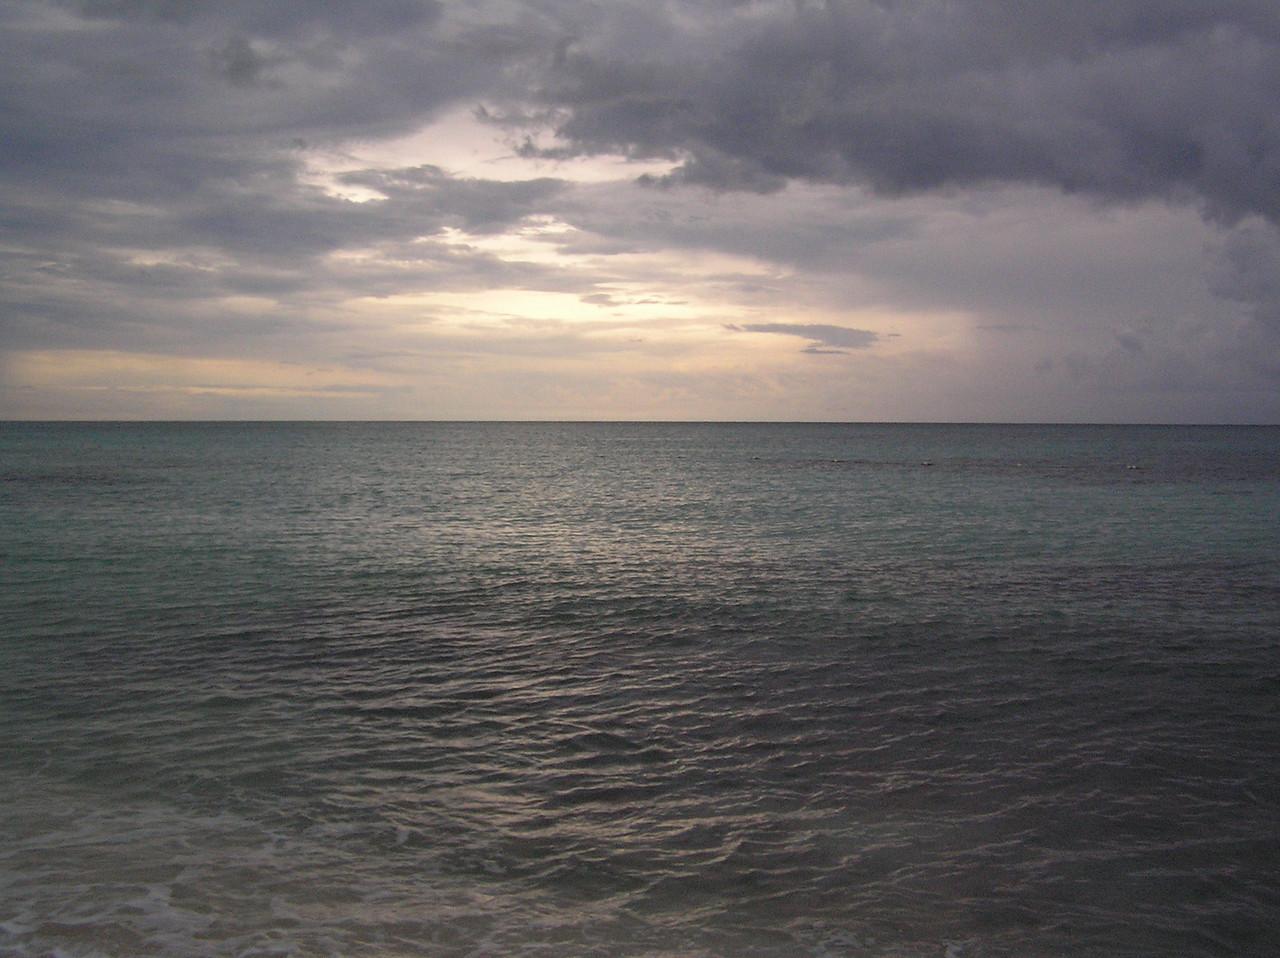 The sunset at Iberostar Paraiso Lindo